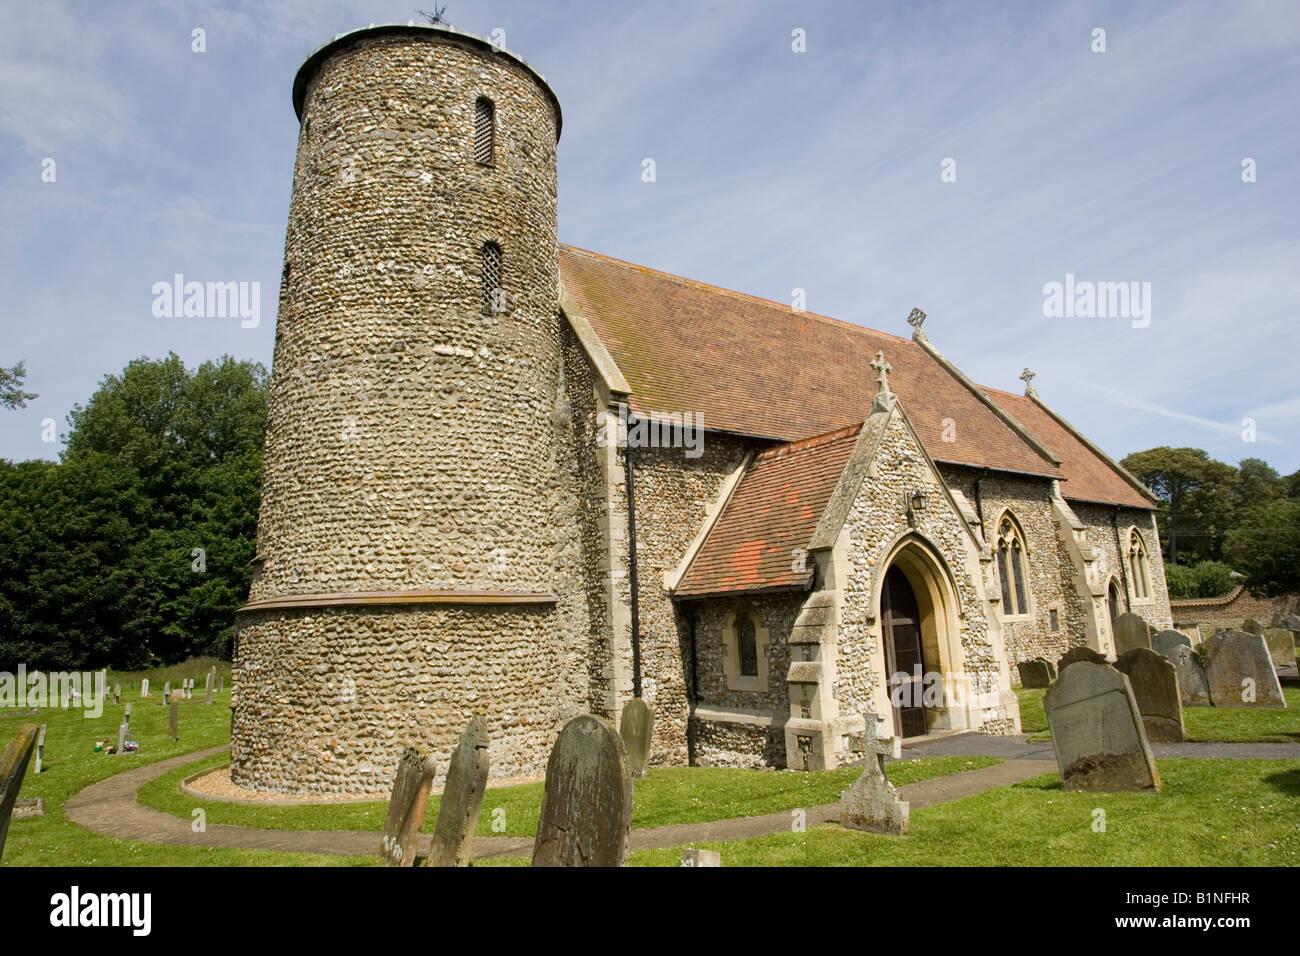 Round Stone Tower Stock Photos & Round Stone Tower Stock Images - Alamy